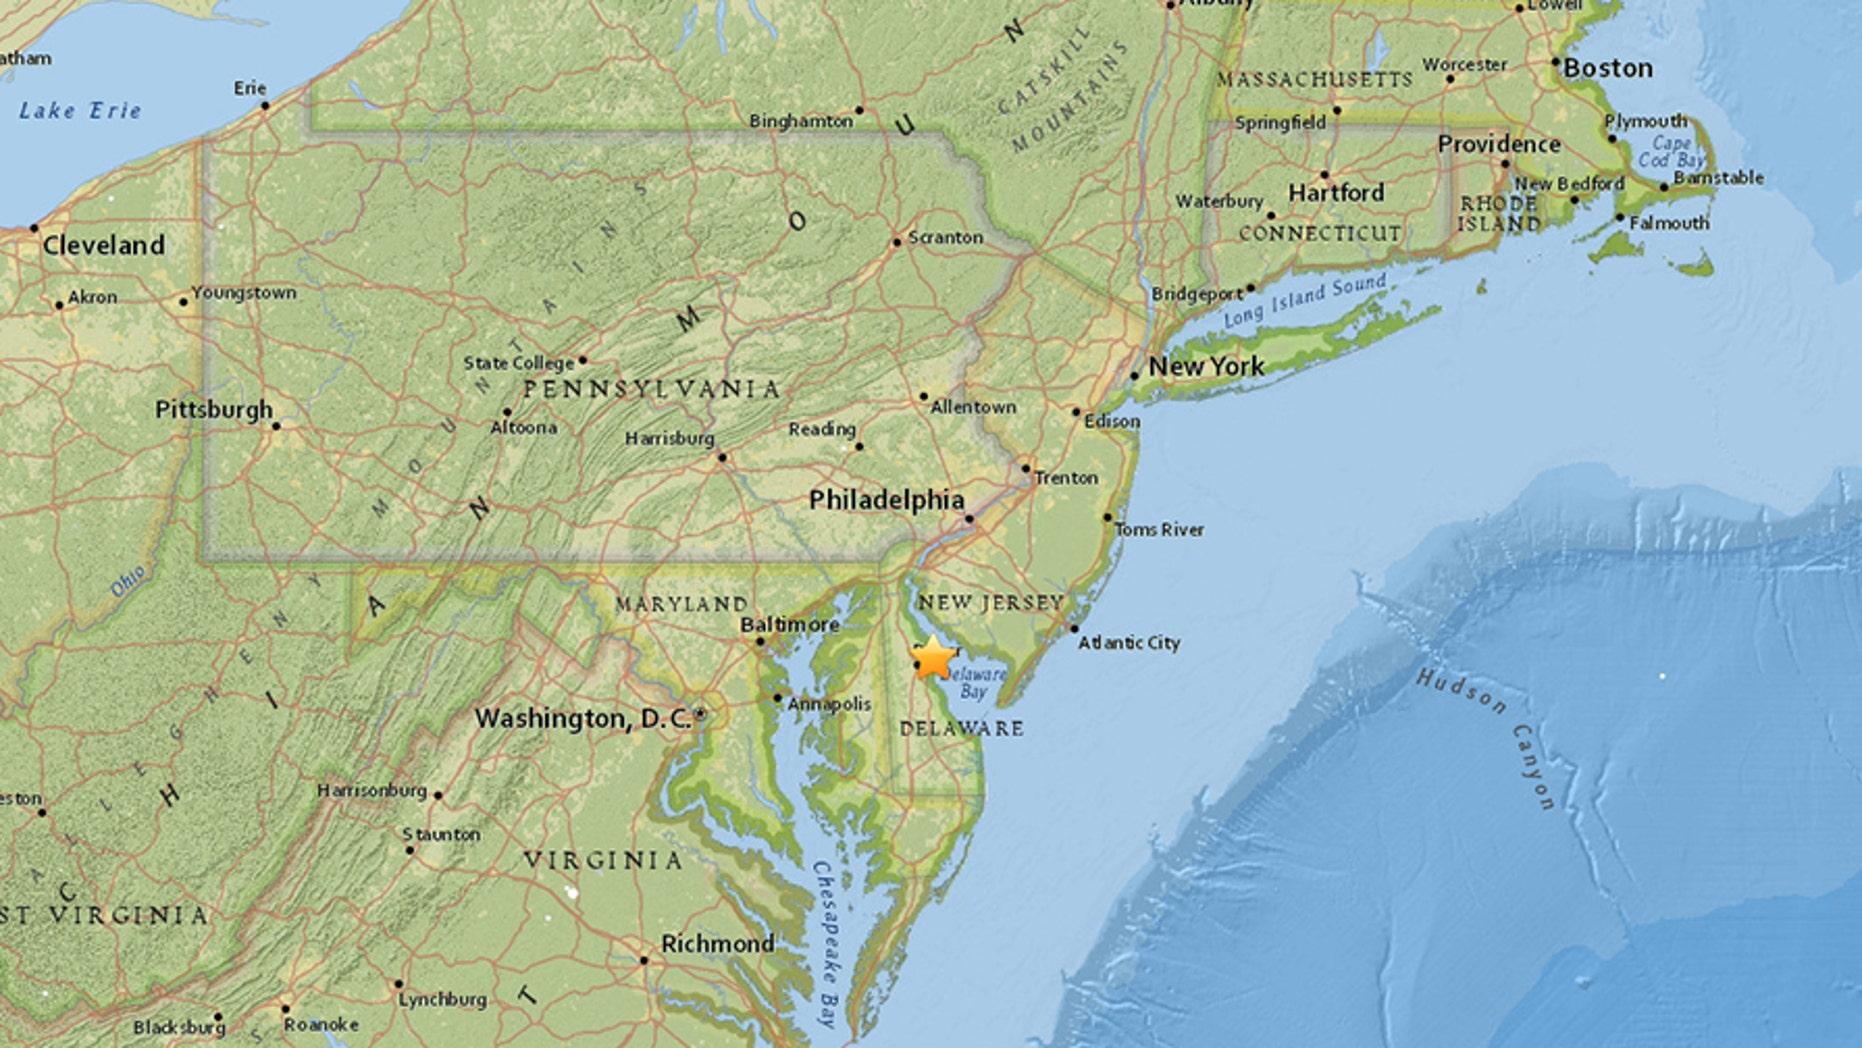 A 4.4 magnitude earthquake struck the east coast of the U.S. on Thursday.